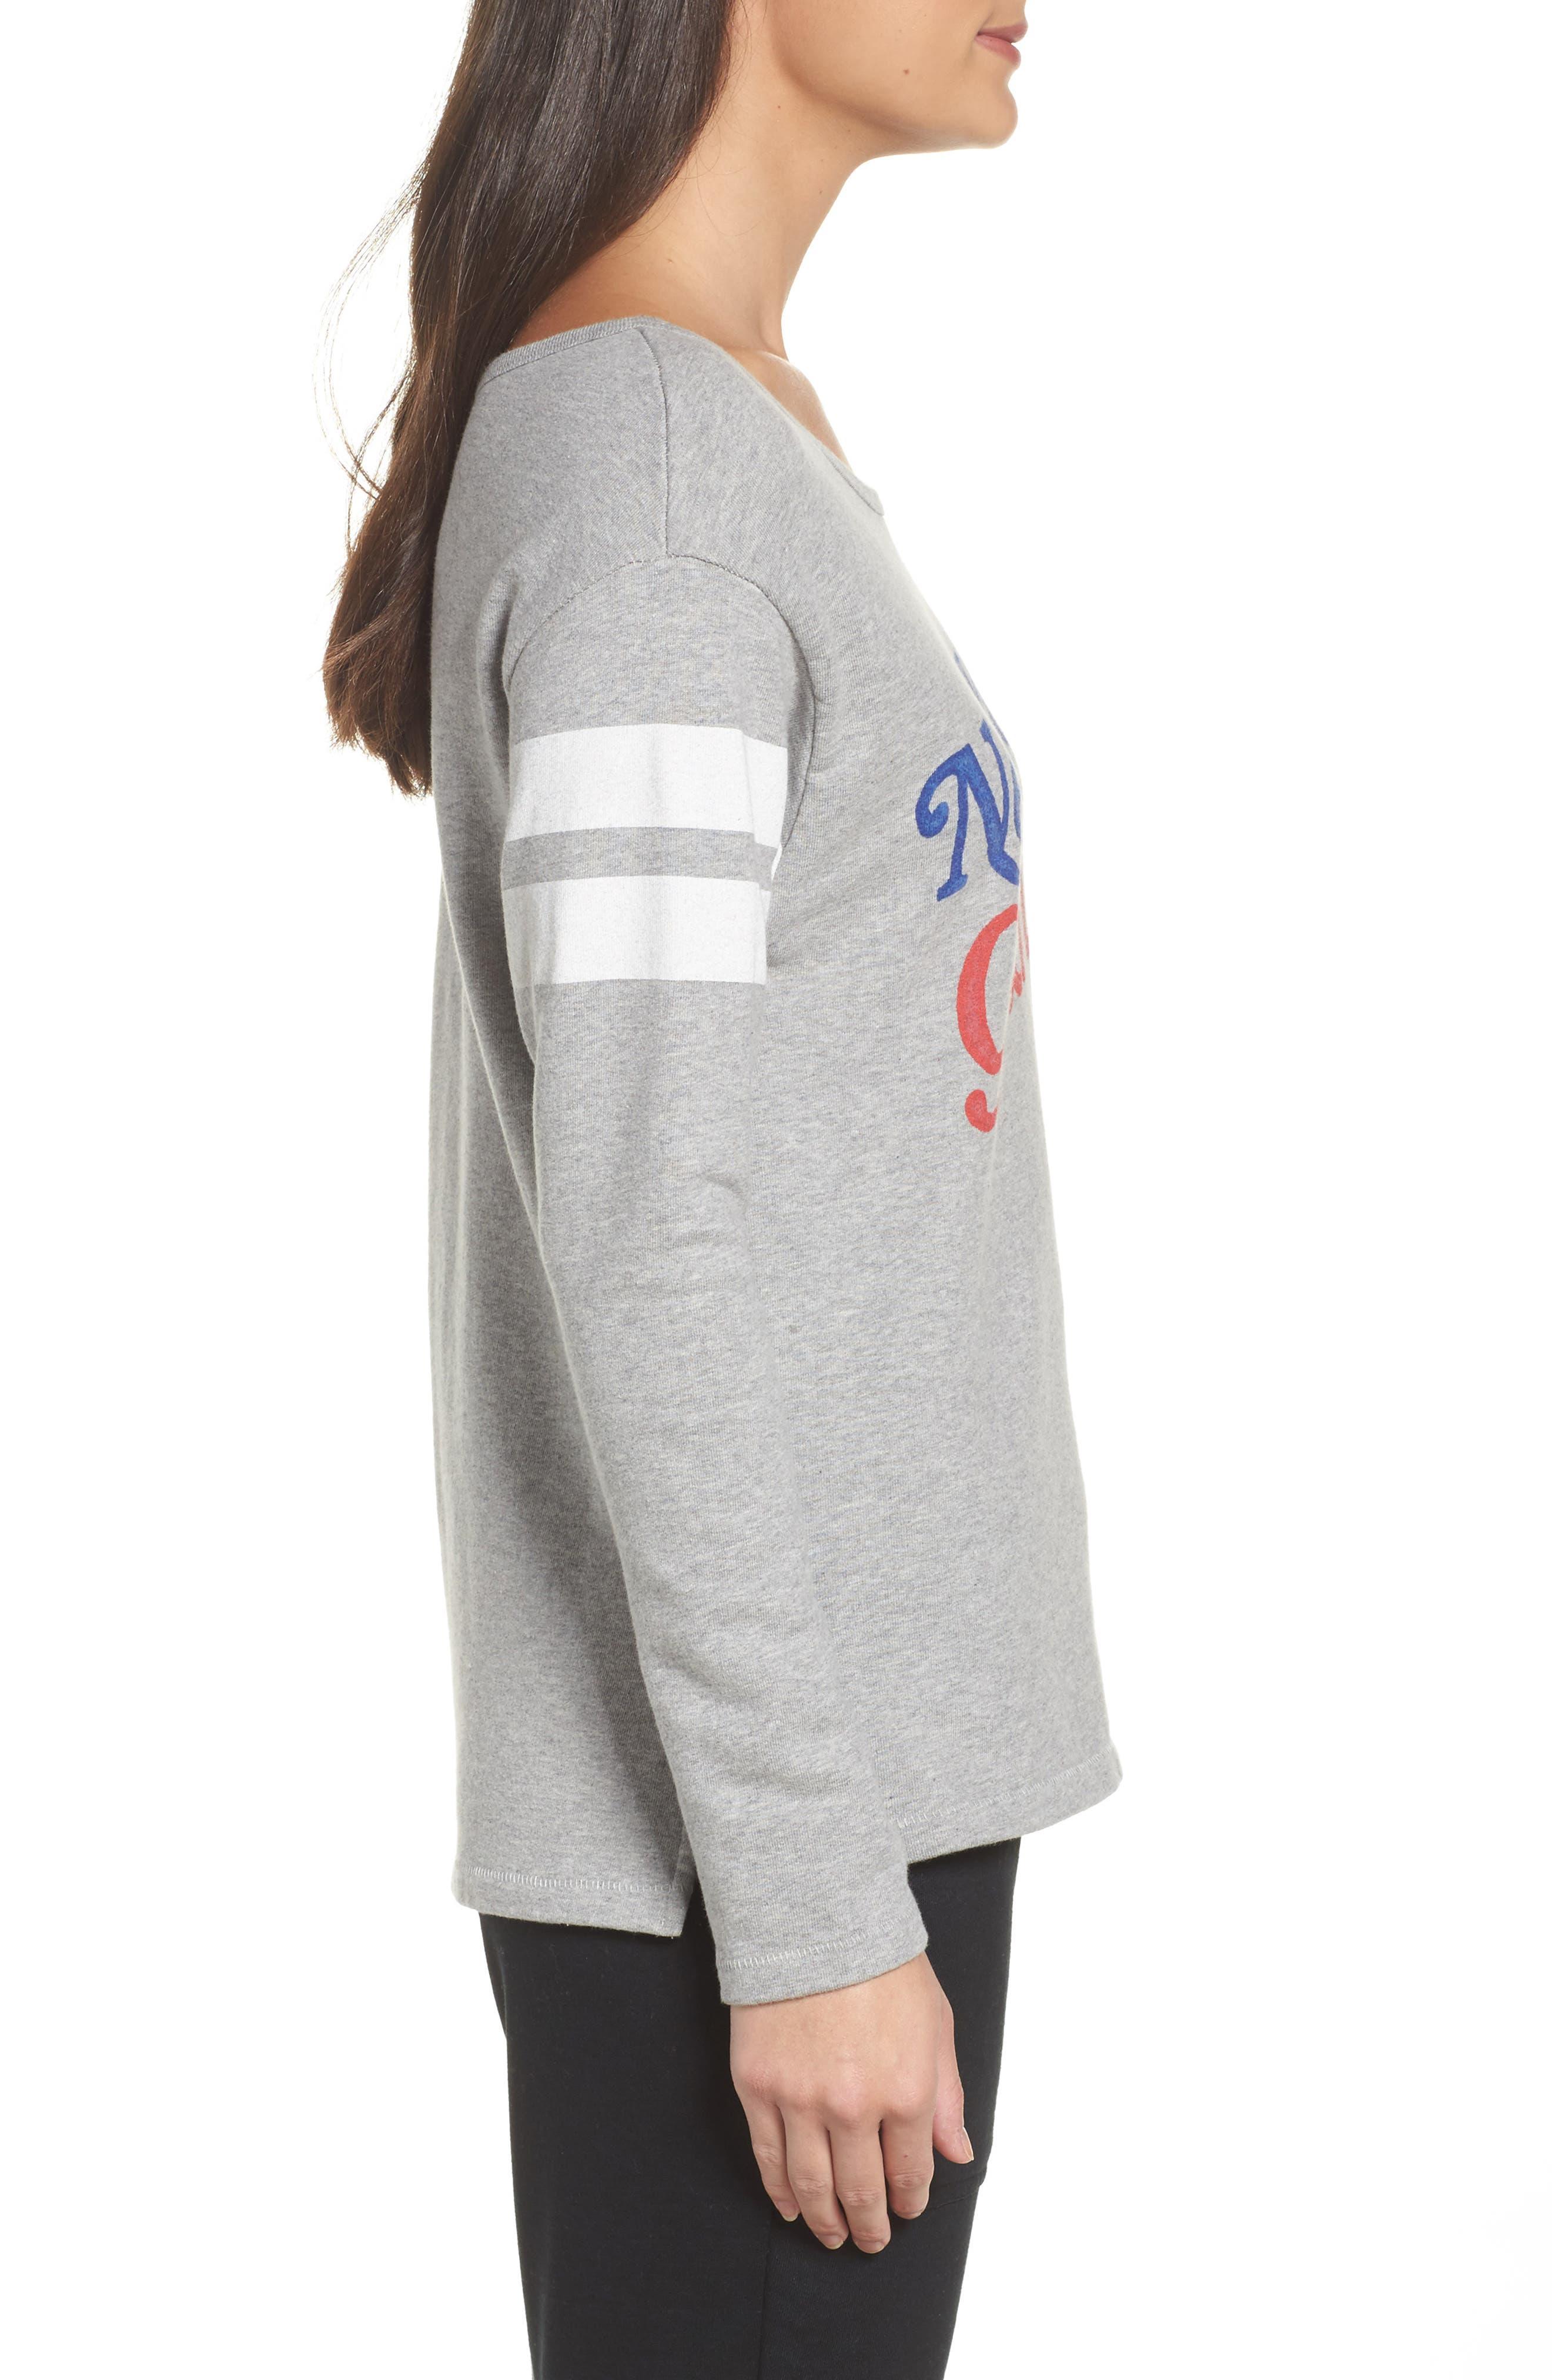 NFL New York Giants Champion Sweatshirt,                             Alternate thumbnail 3, color,                             Grey